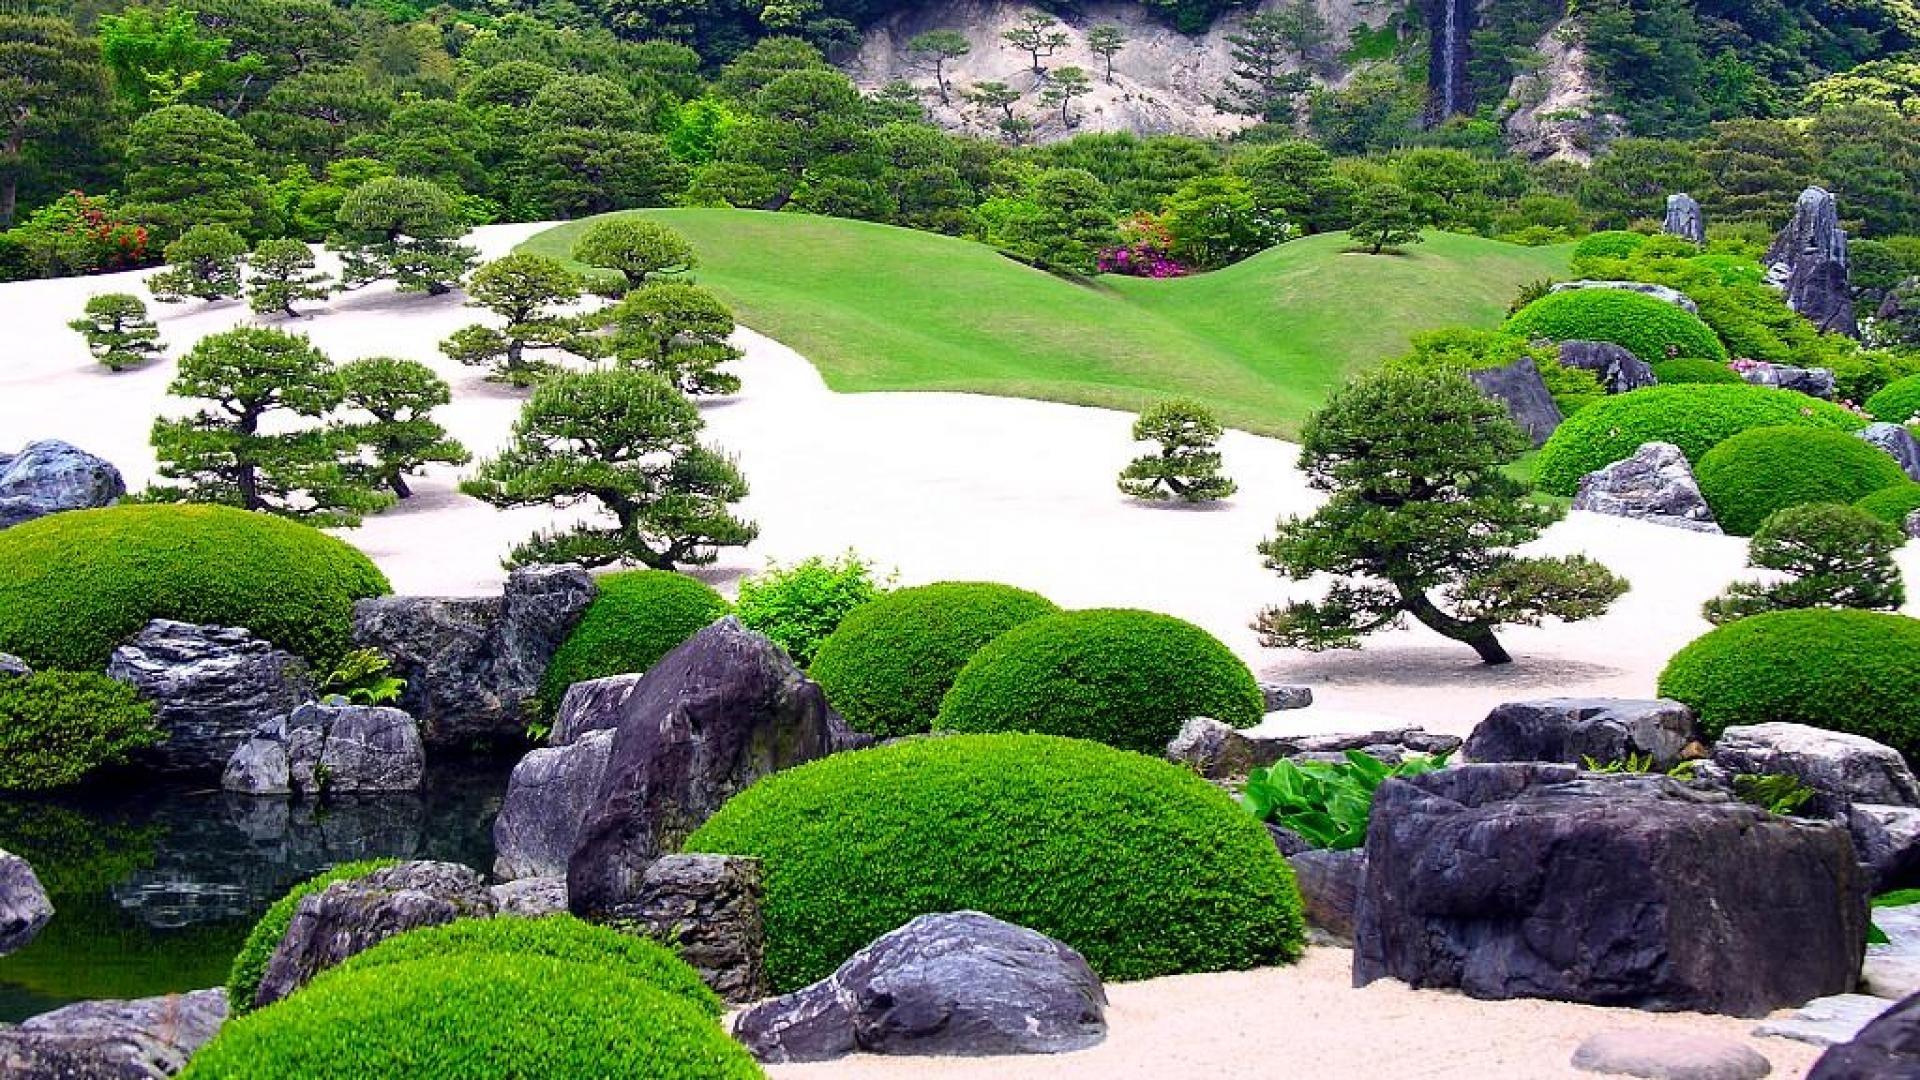 jardin zen fond d'écran hd